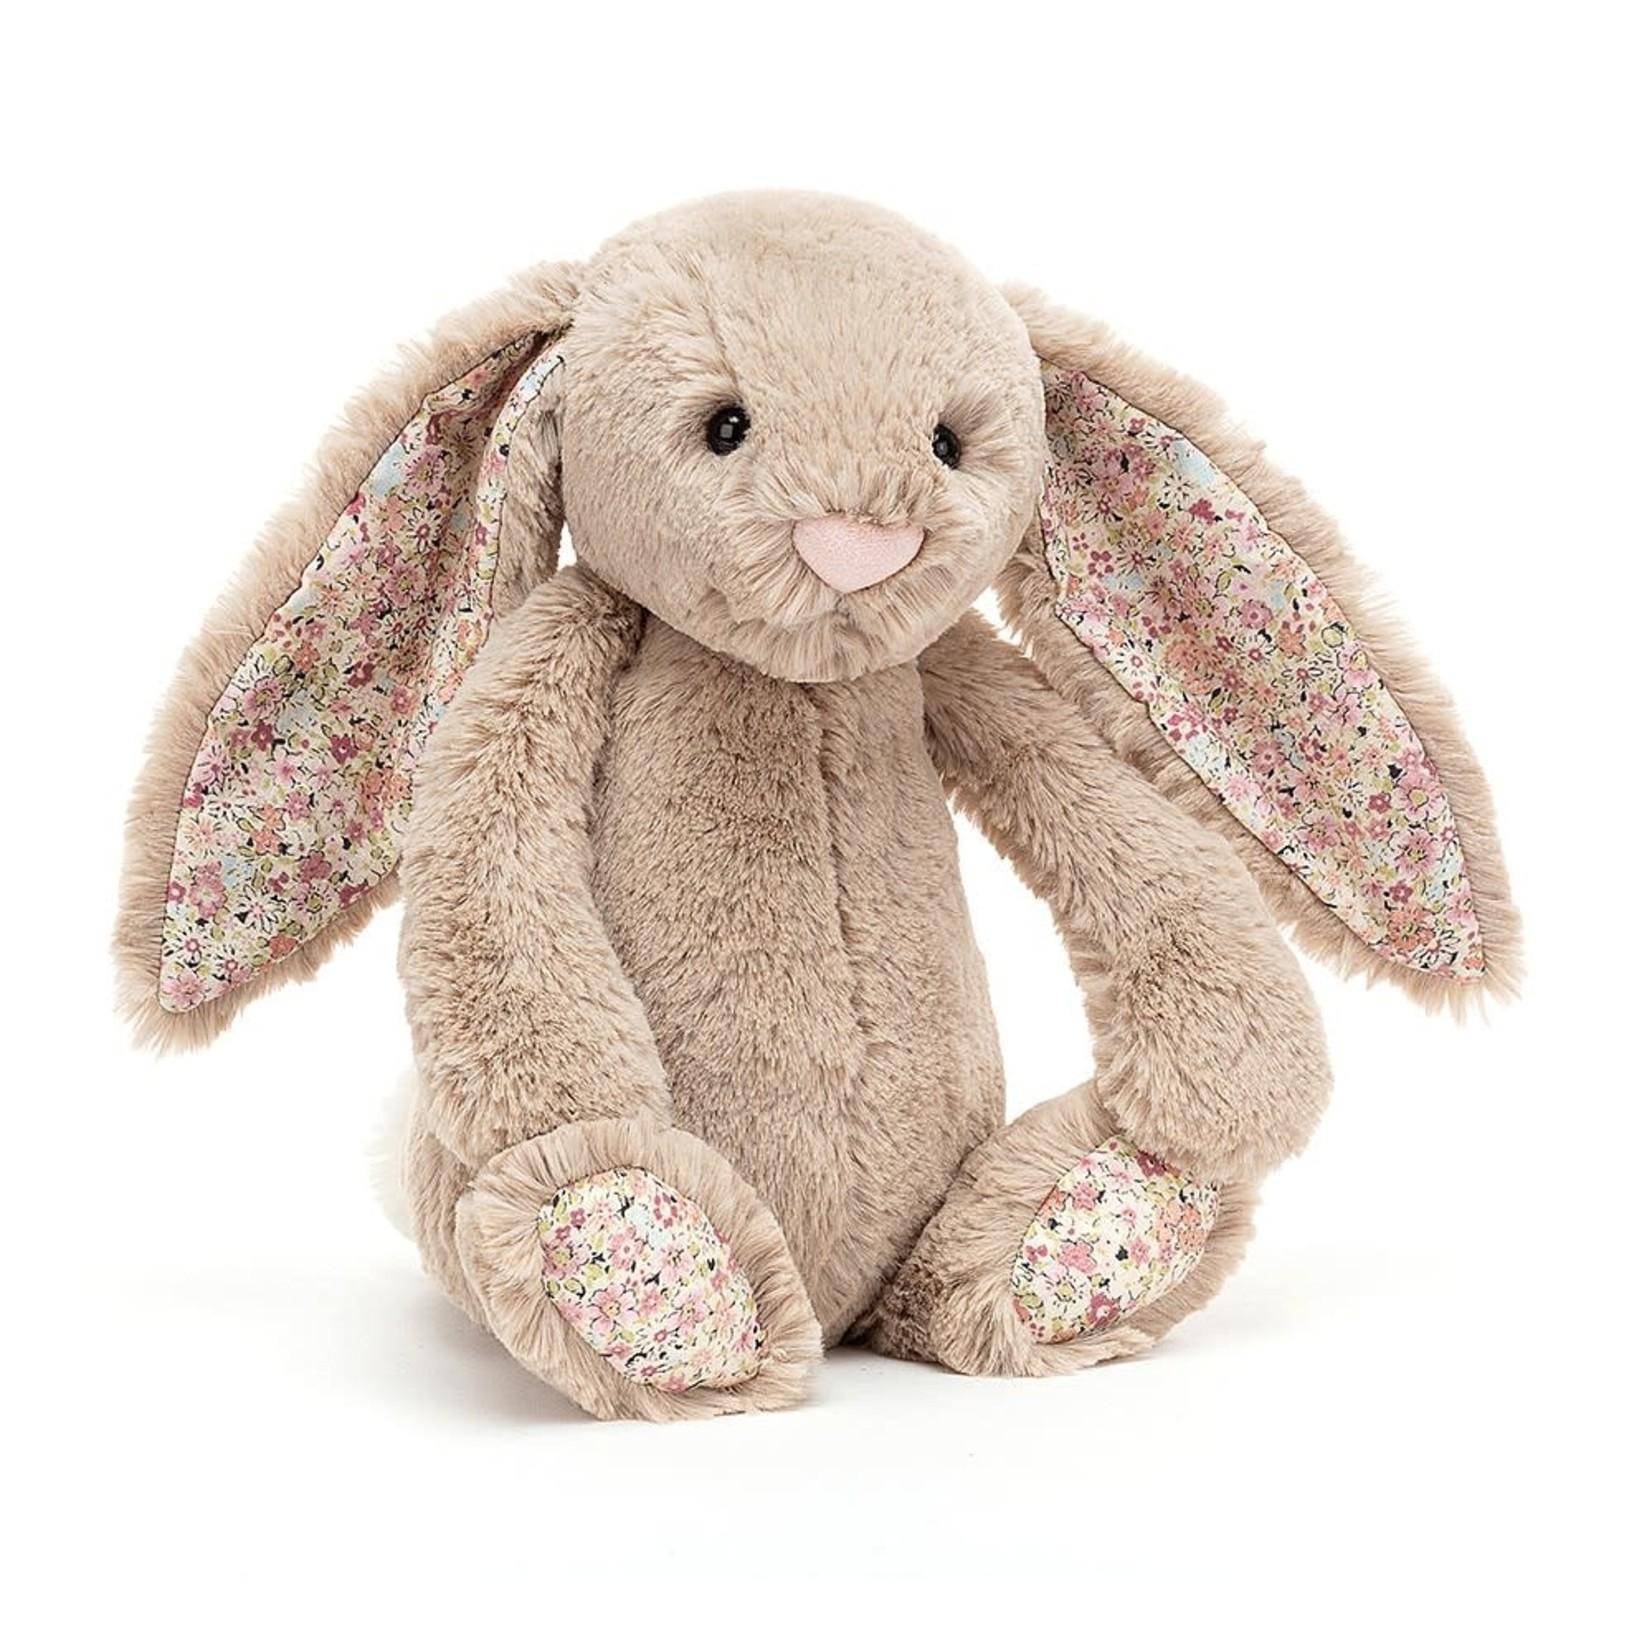 Jellycat Blossom Bea Beige Bunny Medium